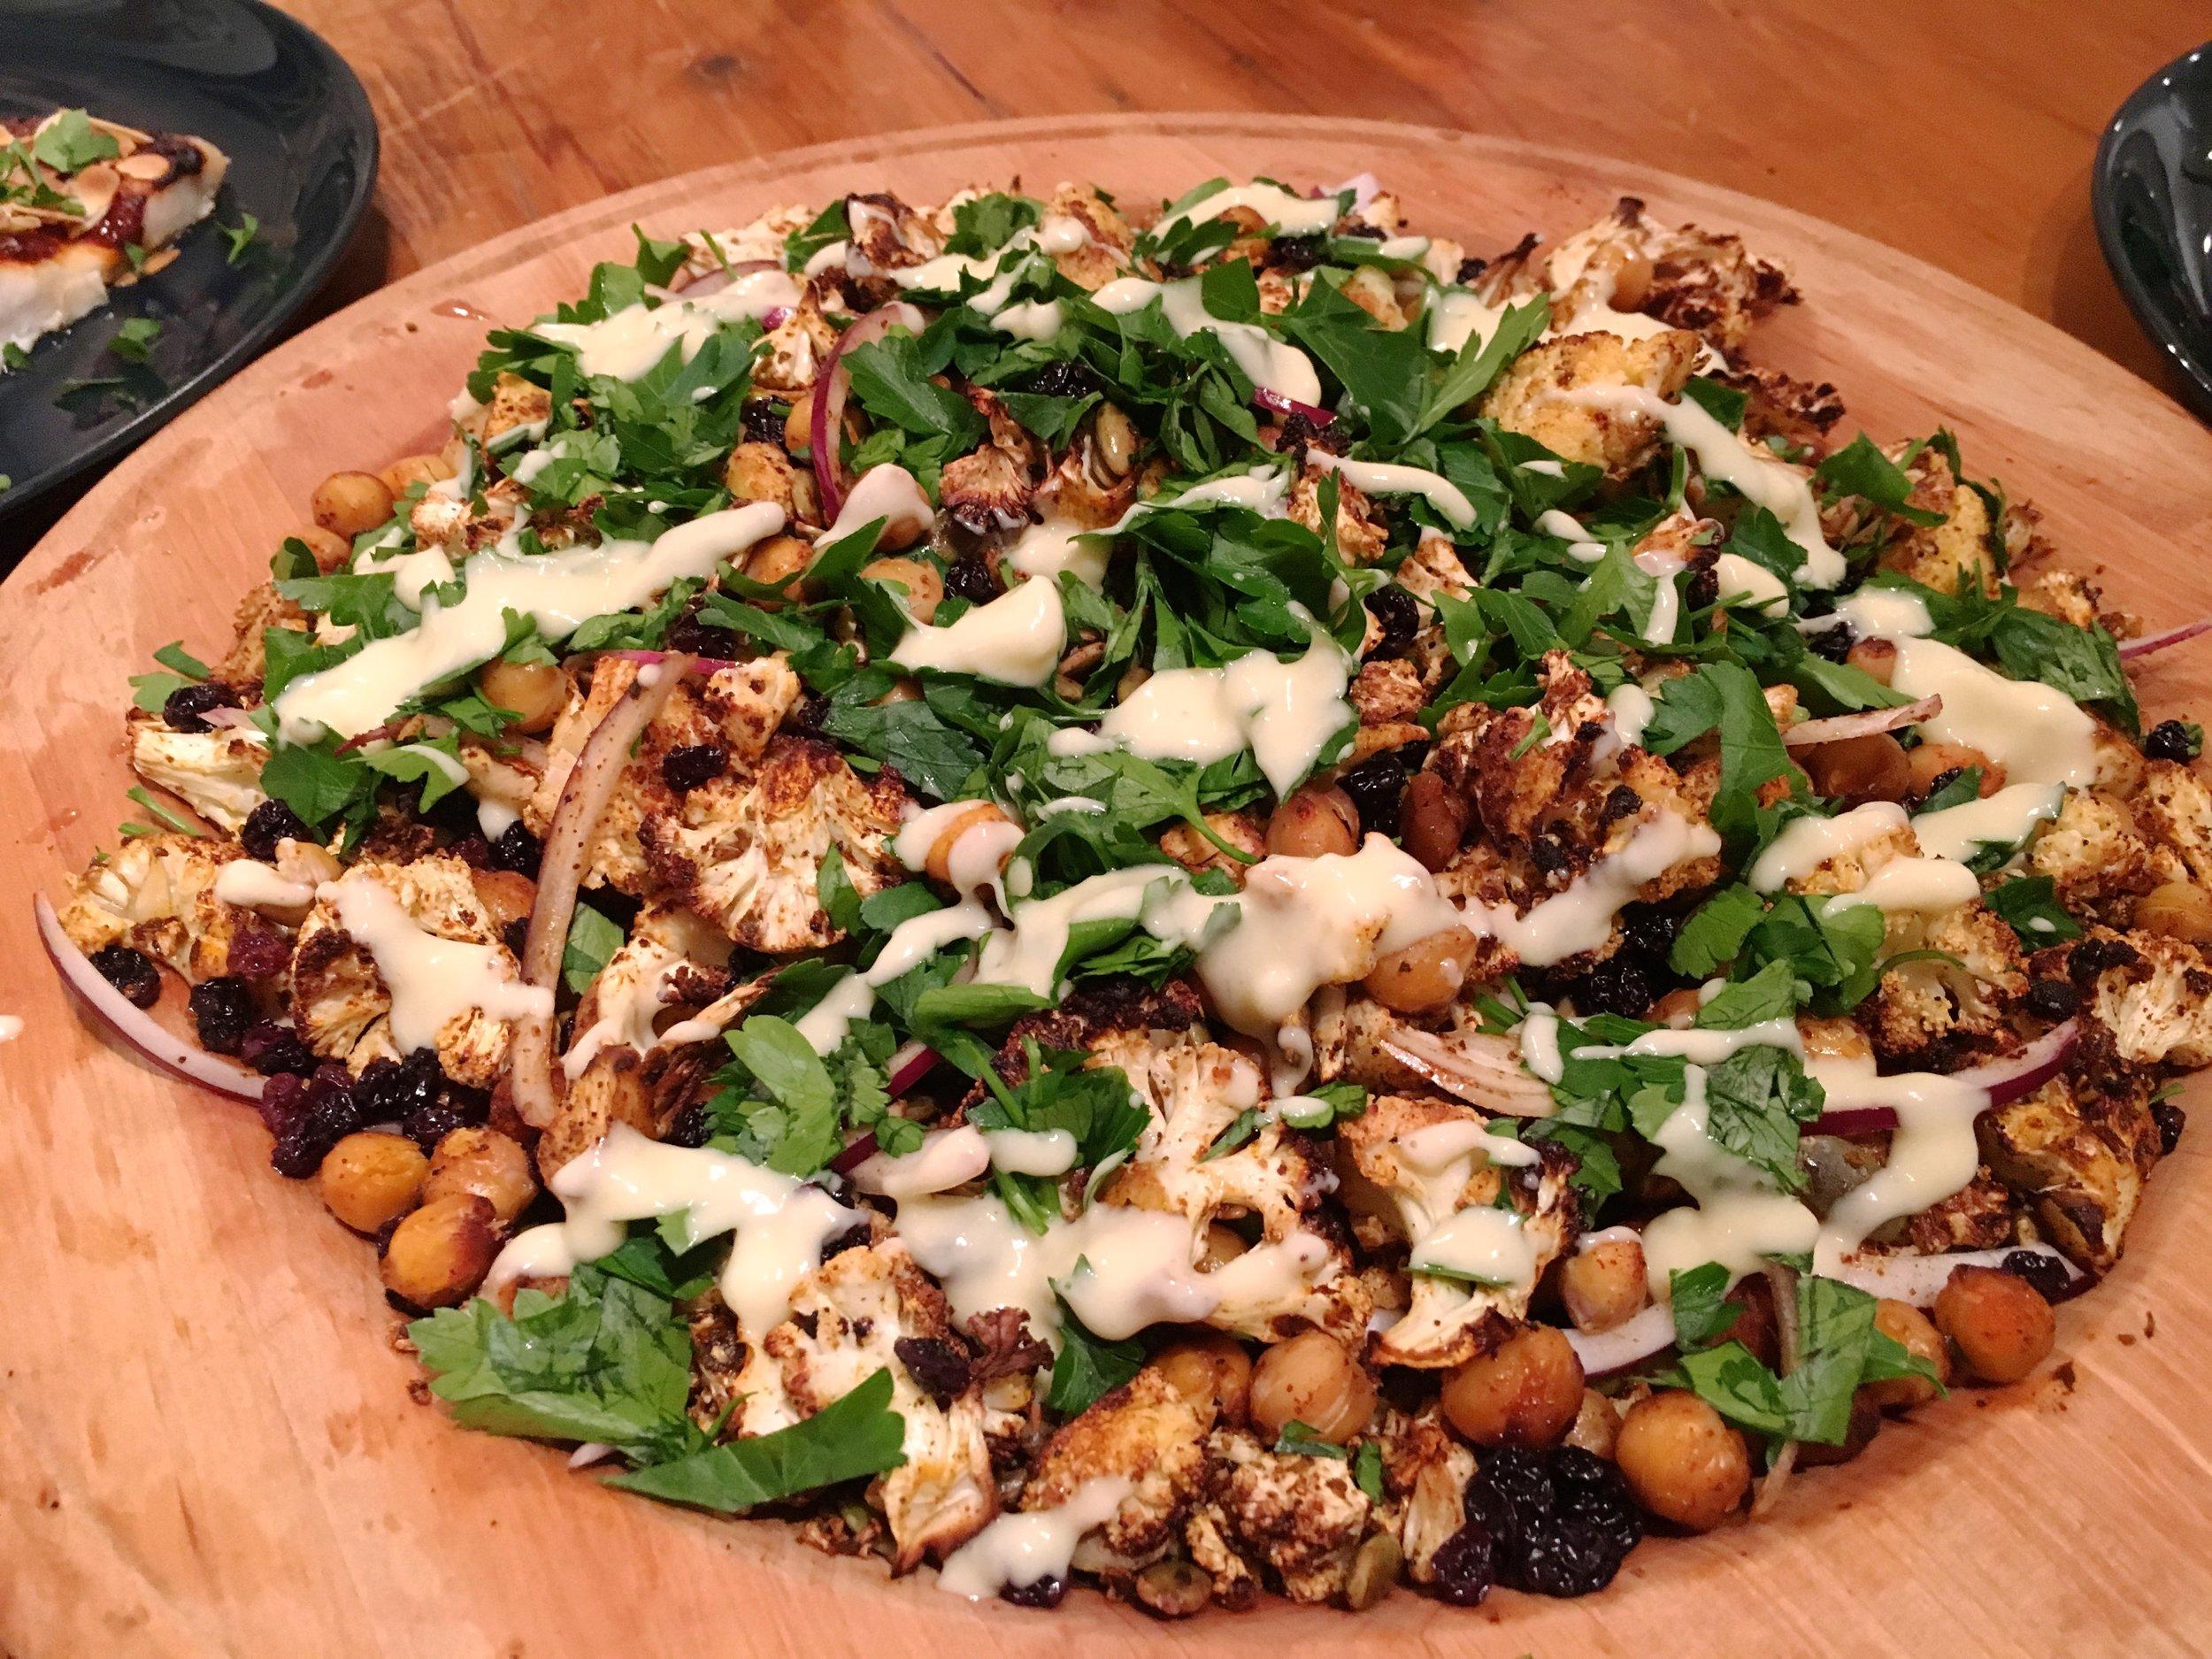 Morrocaan Cauliflower Chickpea Salad Recipe